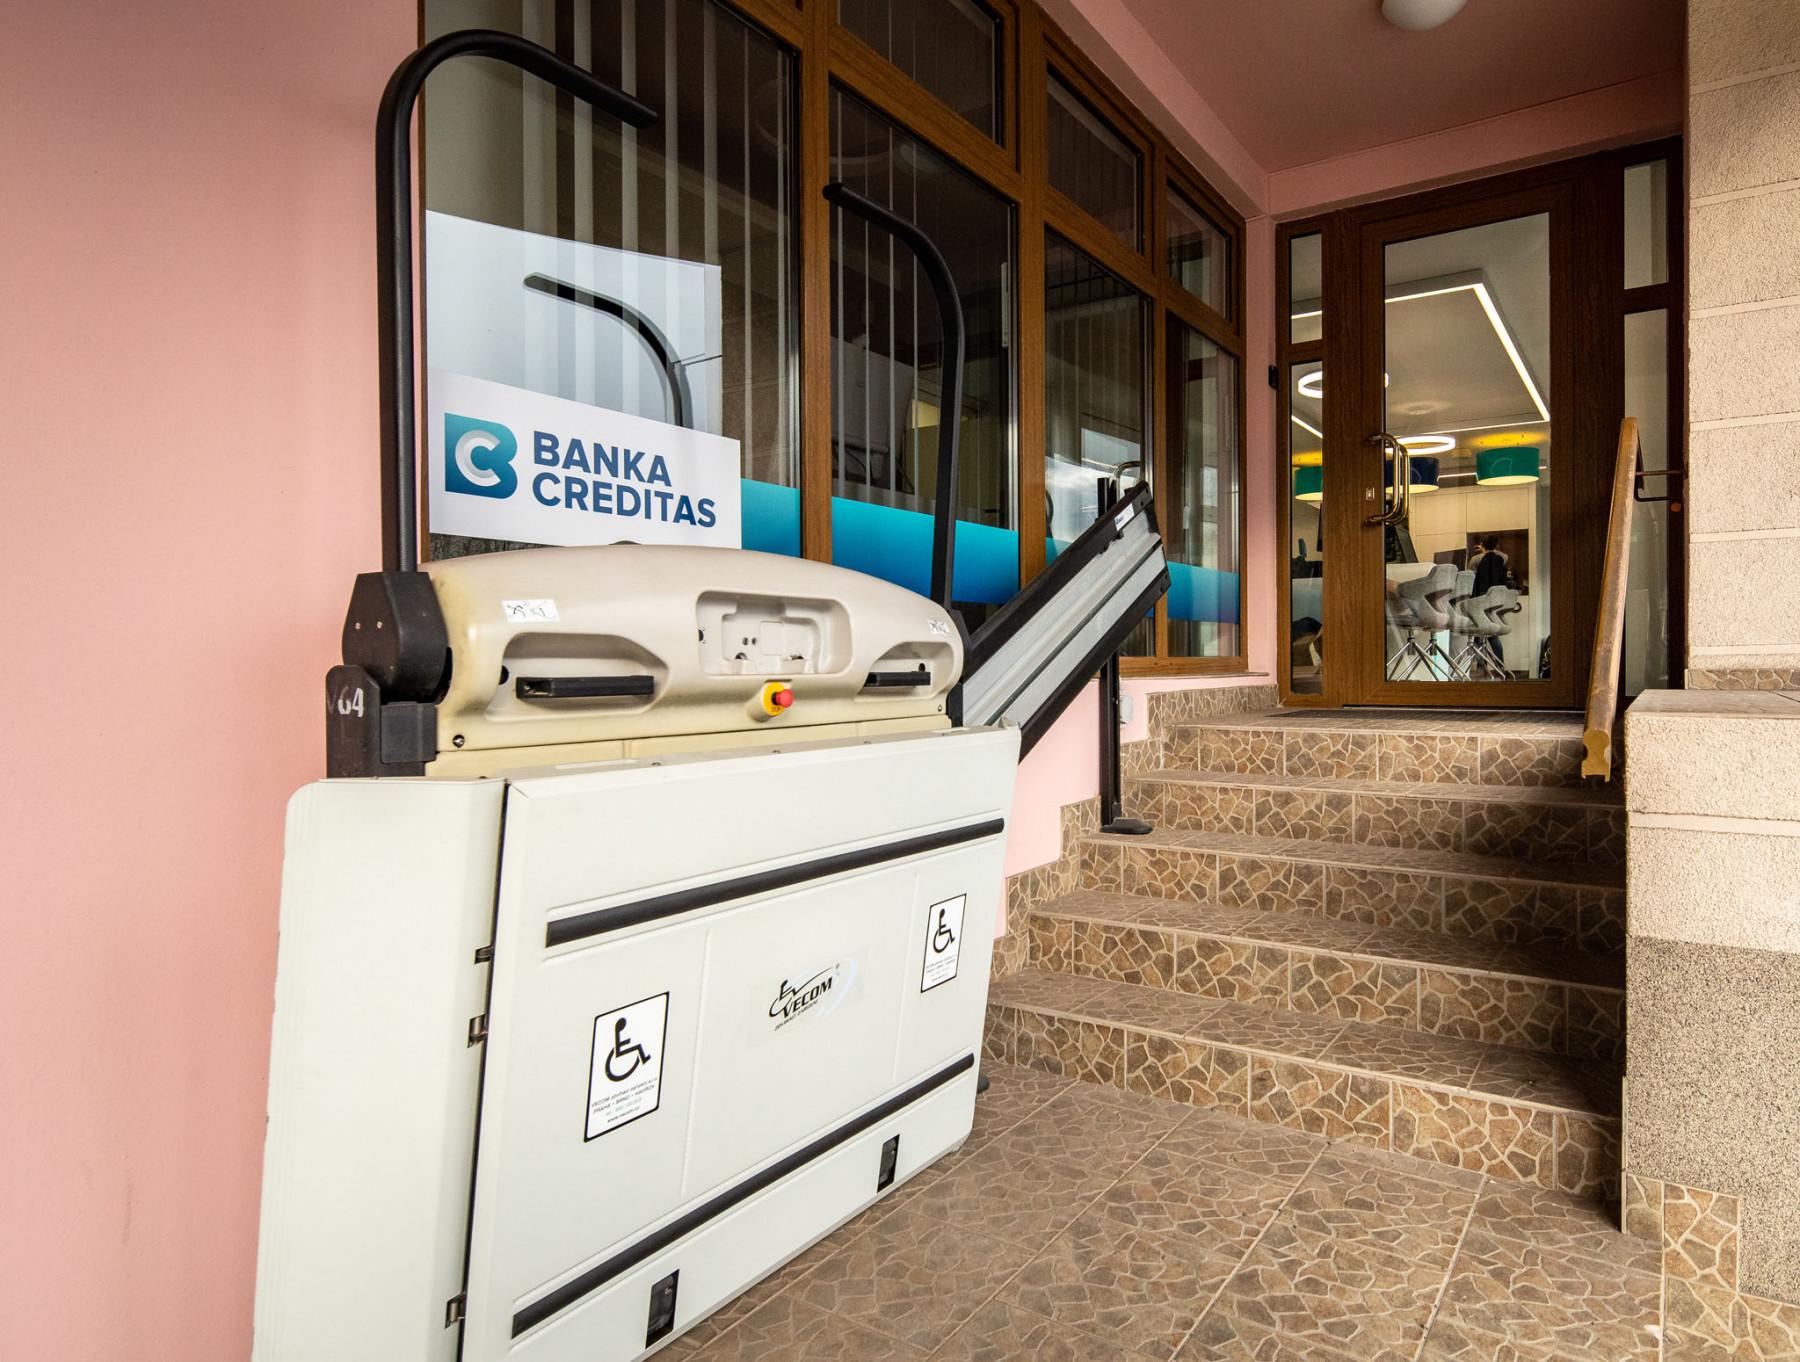 Banka CREDITAS - pobočka Vsetín